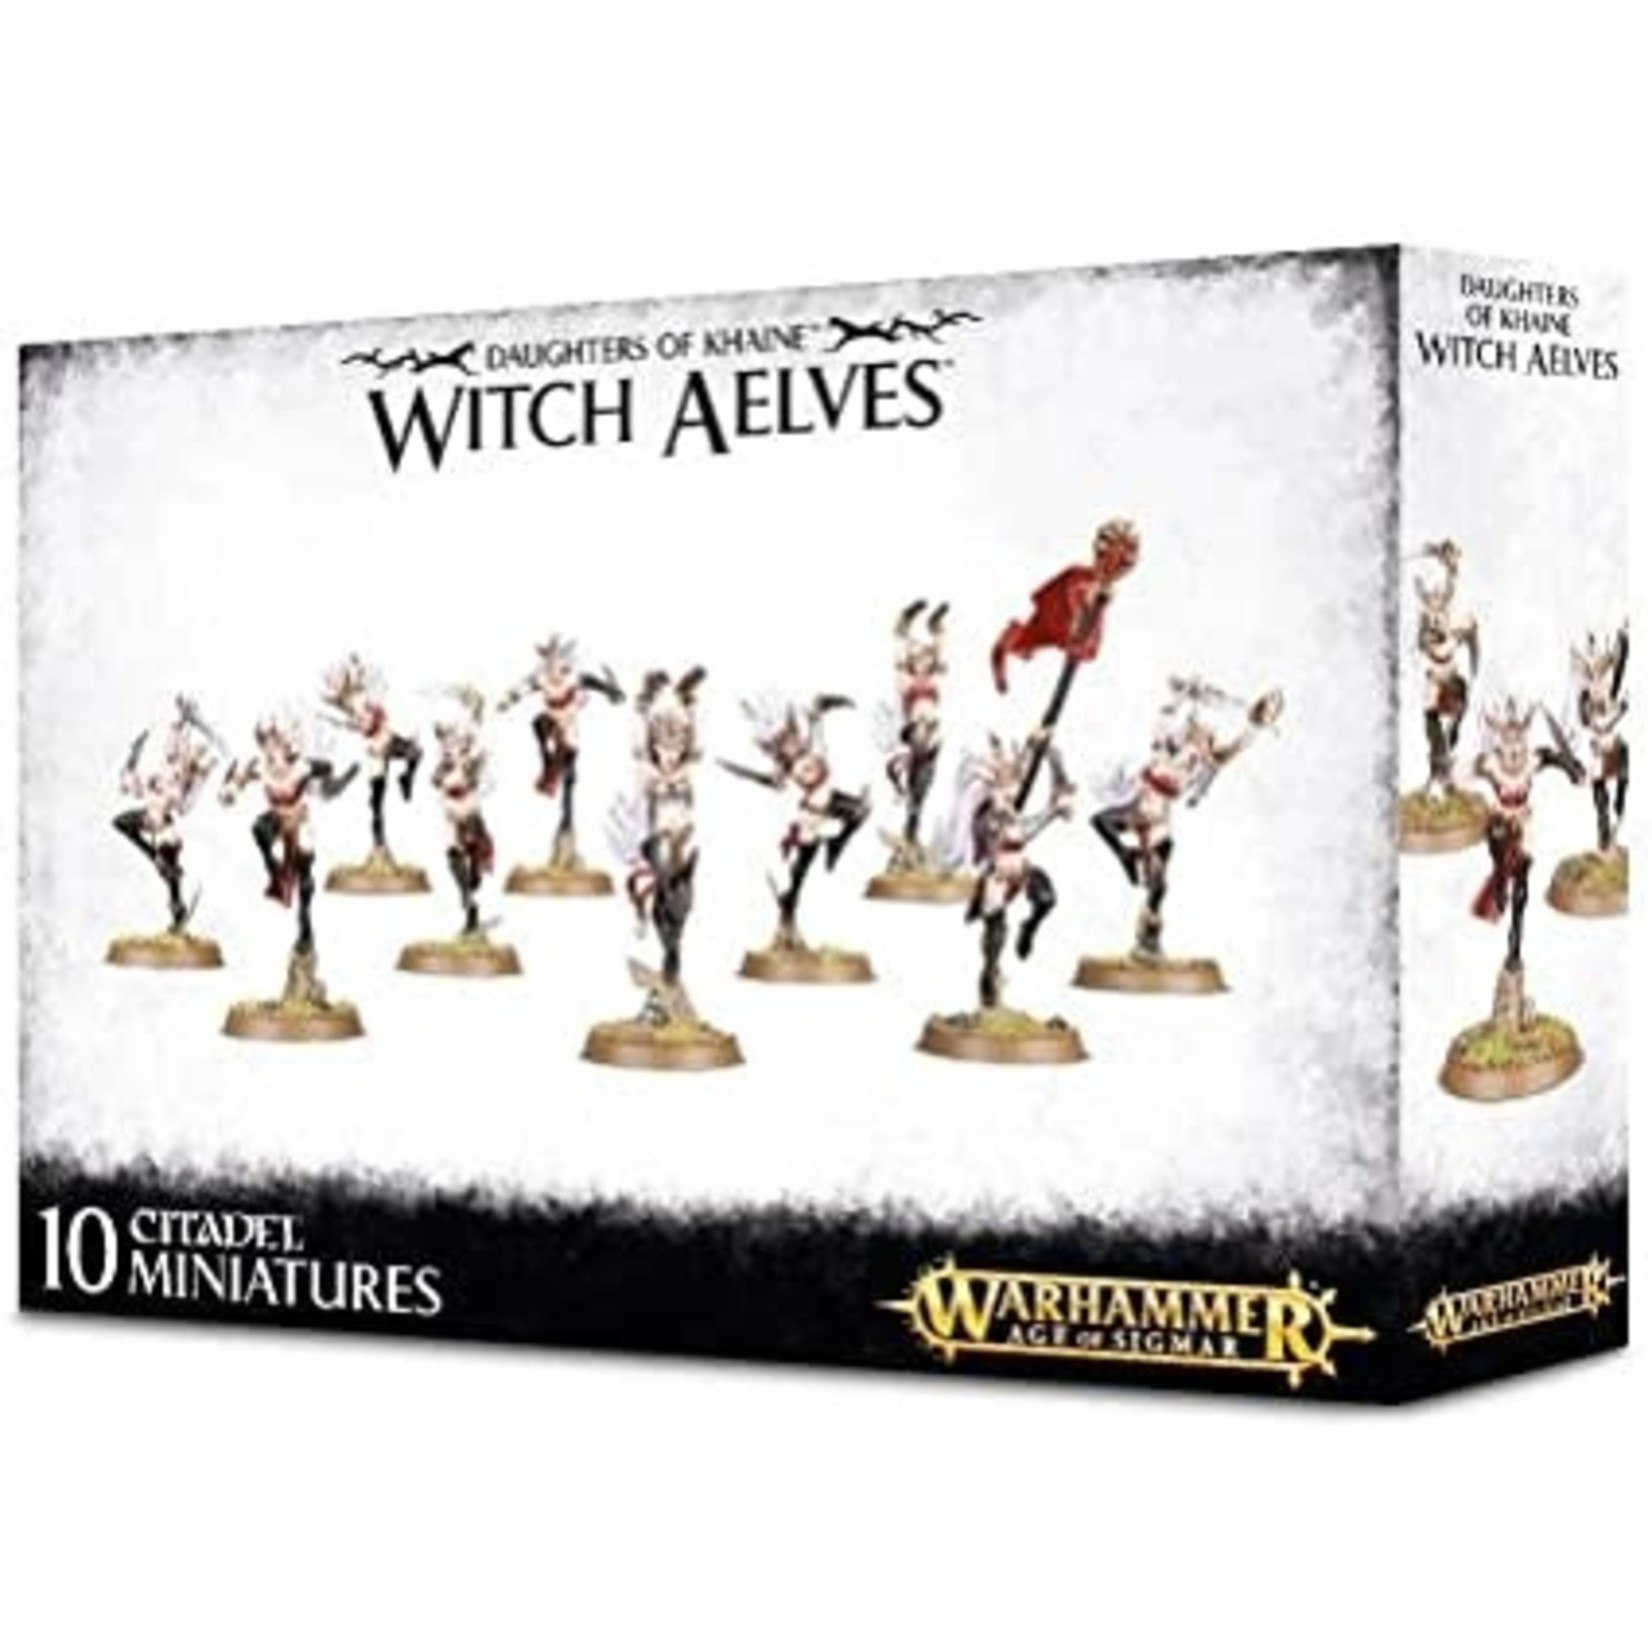 DOK Witch Aelves (AOS)